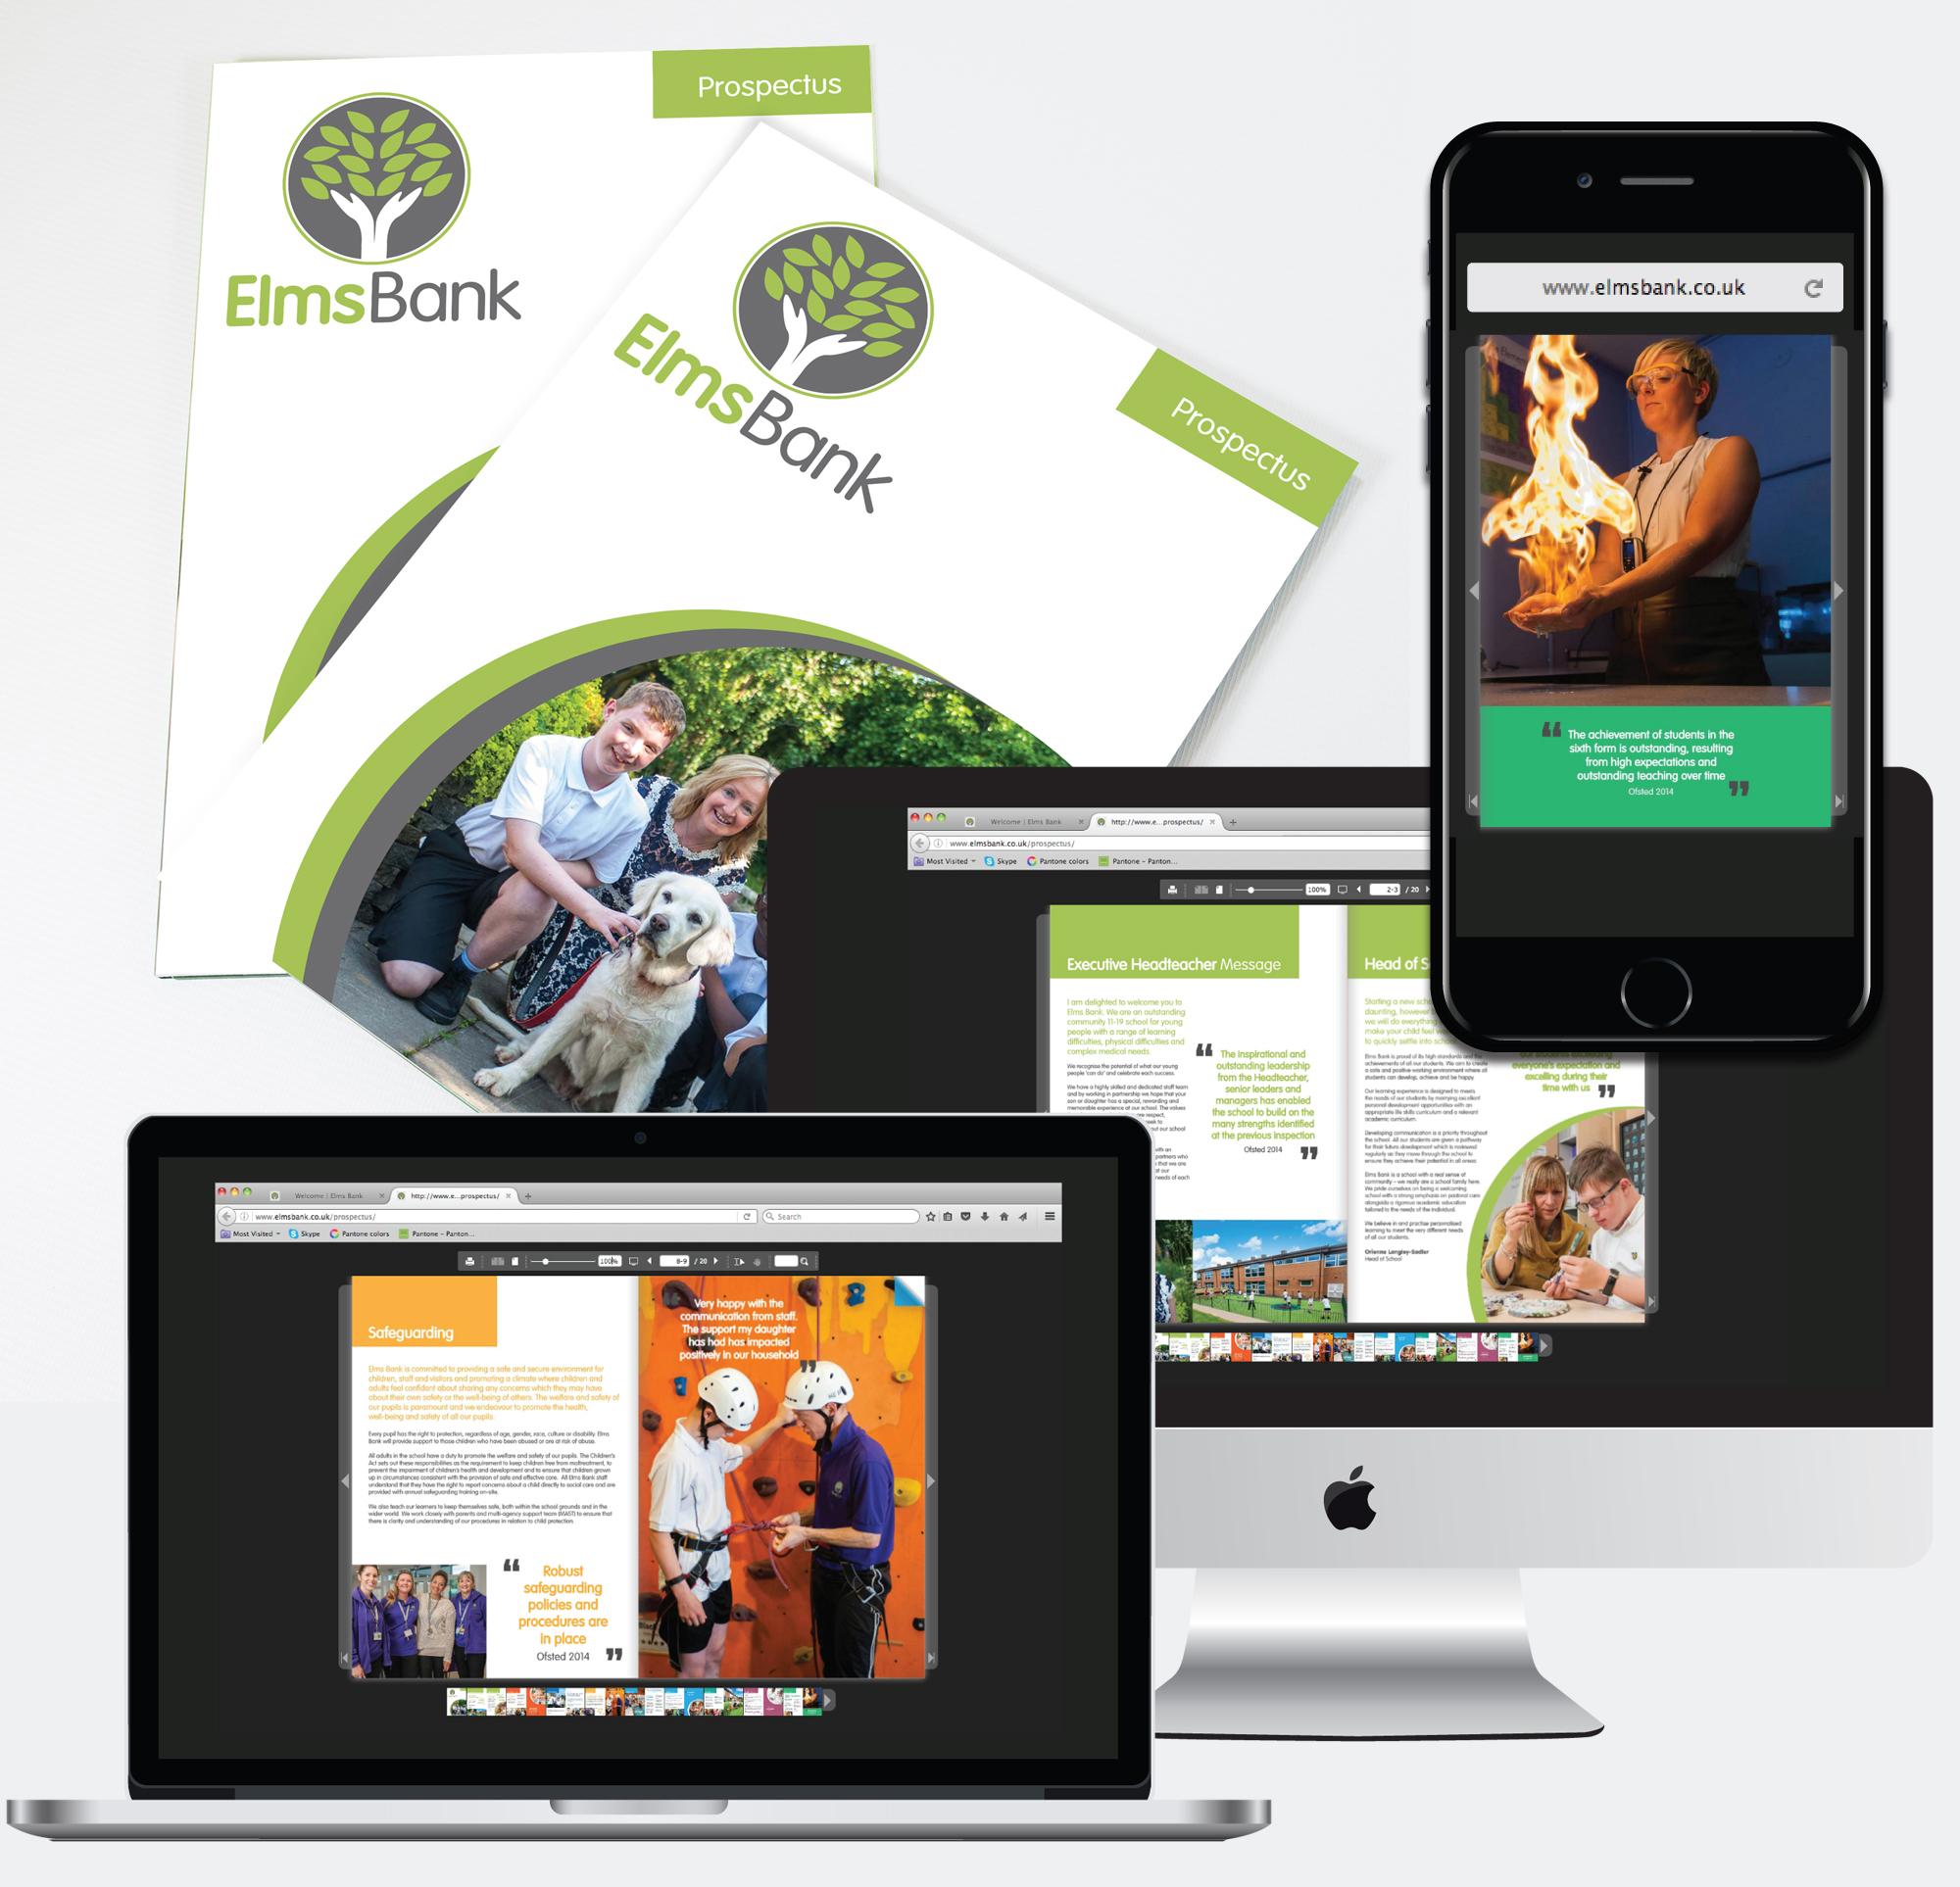 Elms Bank online prospectus & printed prospectus